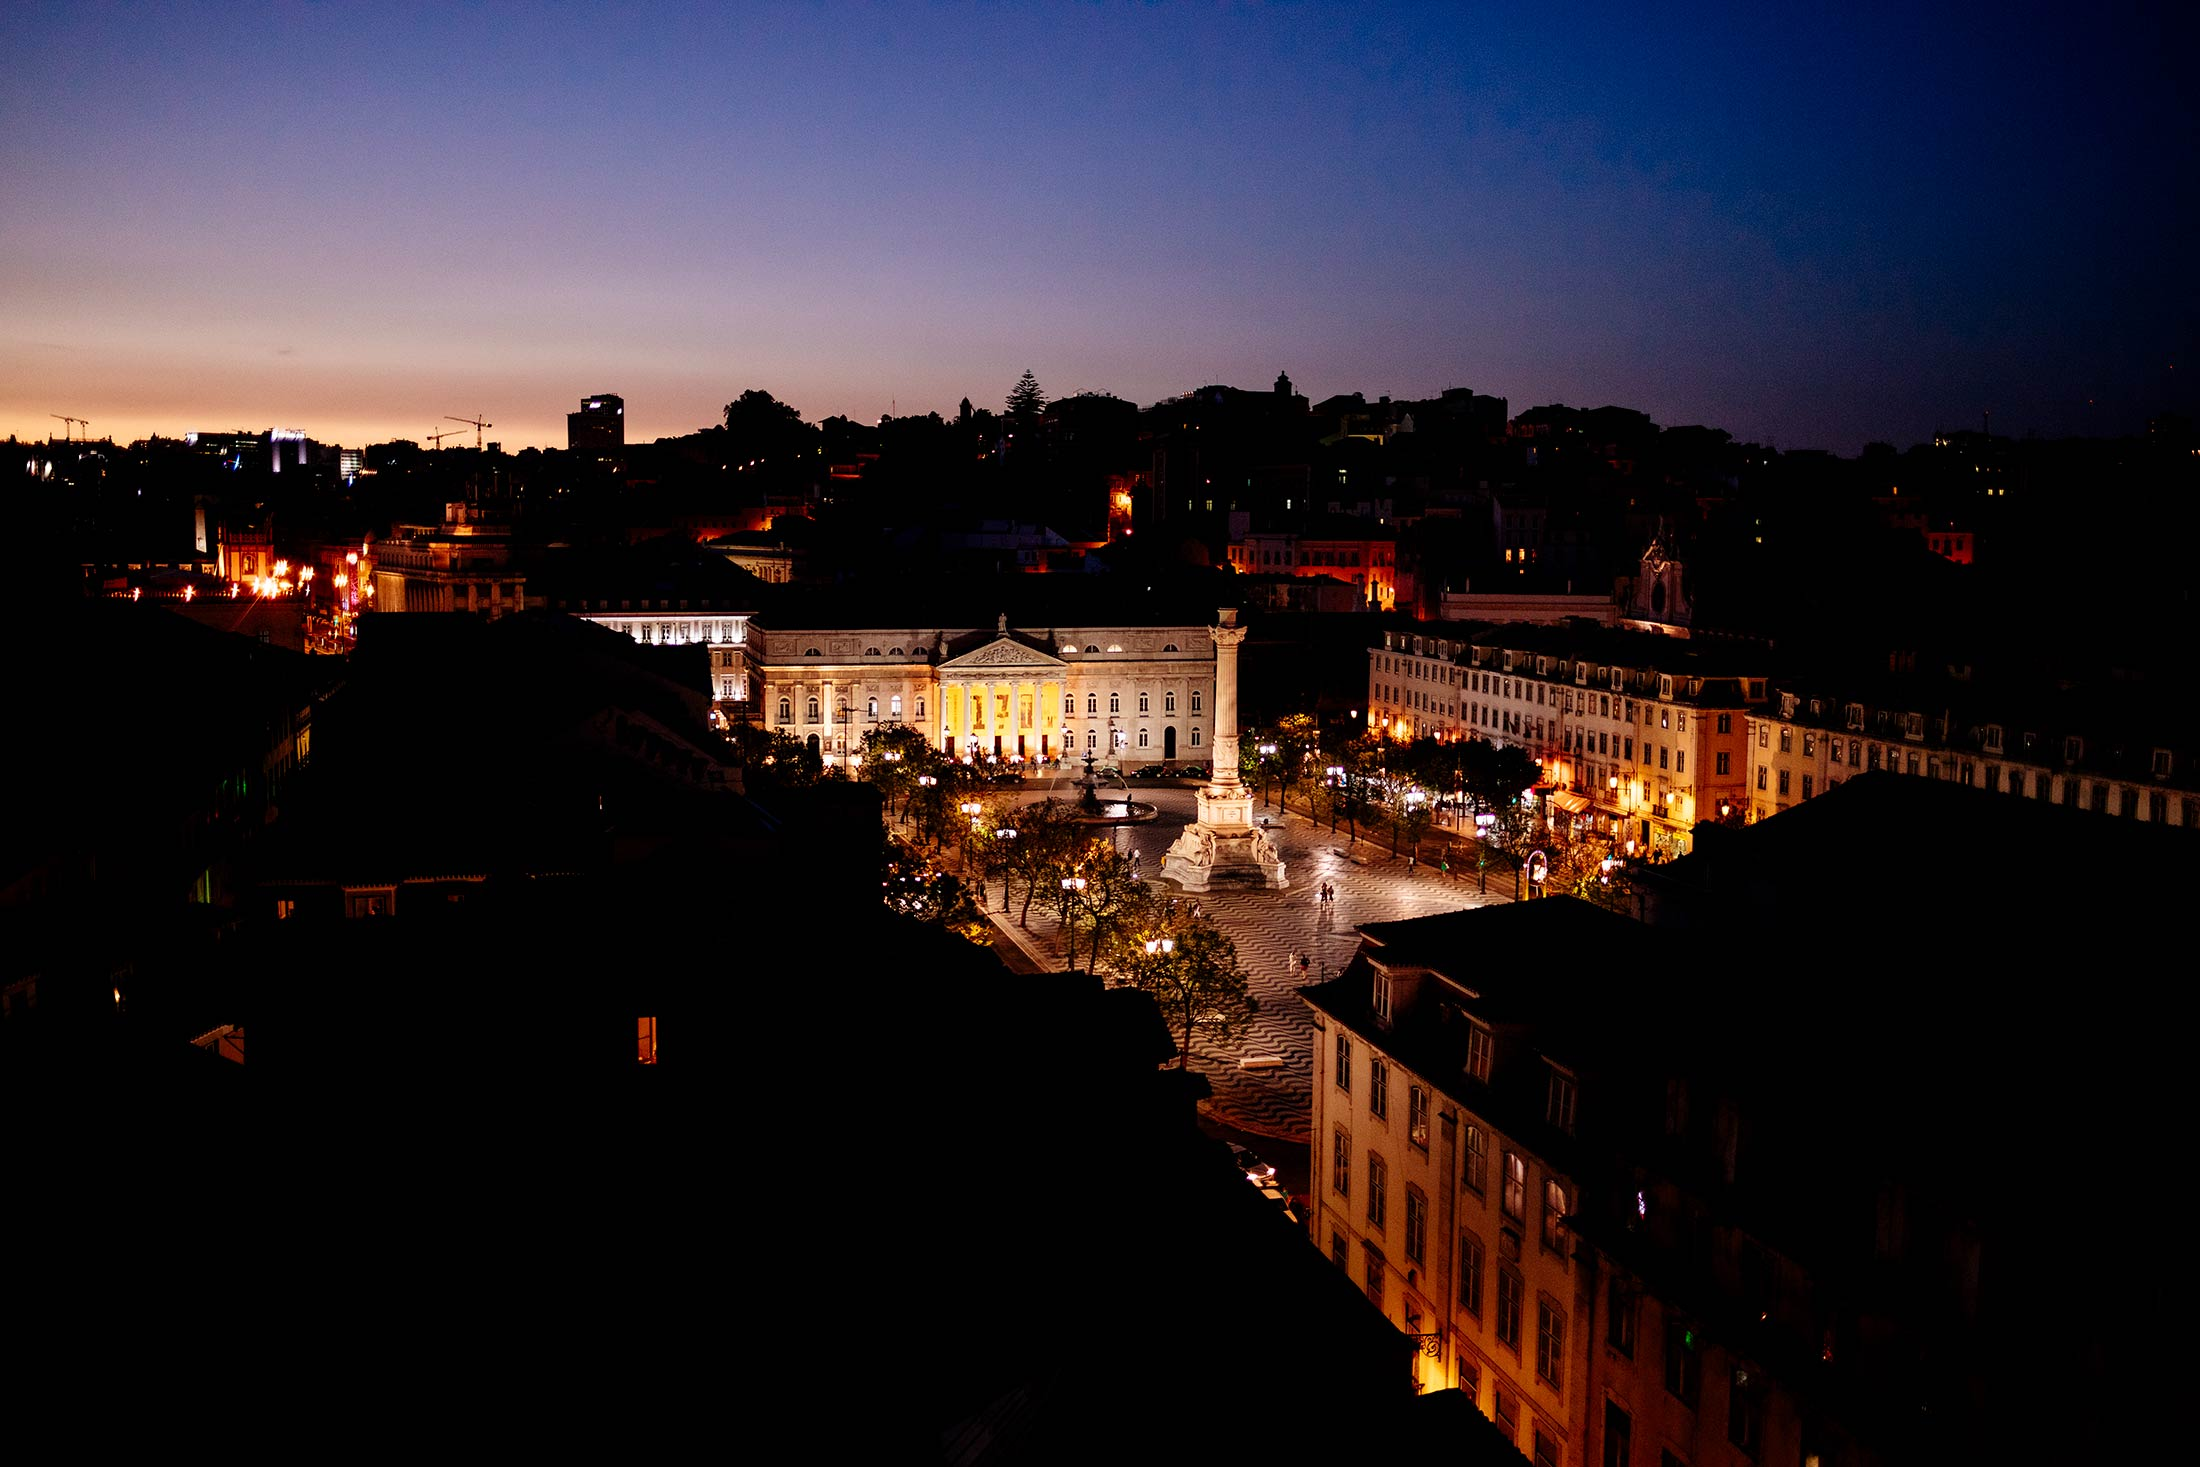 LIS_Lissabon_03-Mitja_Schneehage